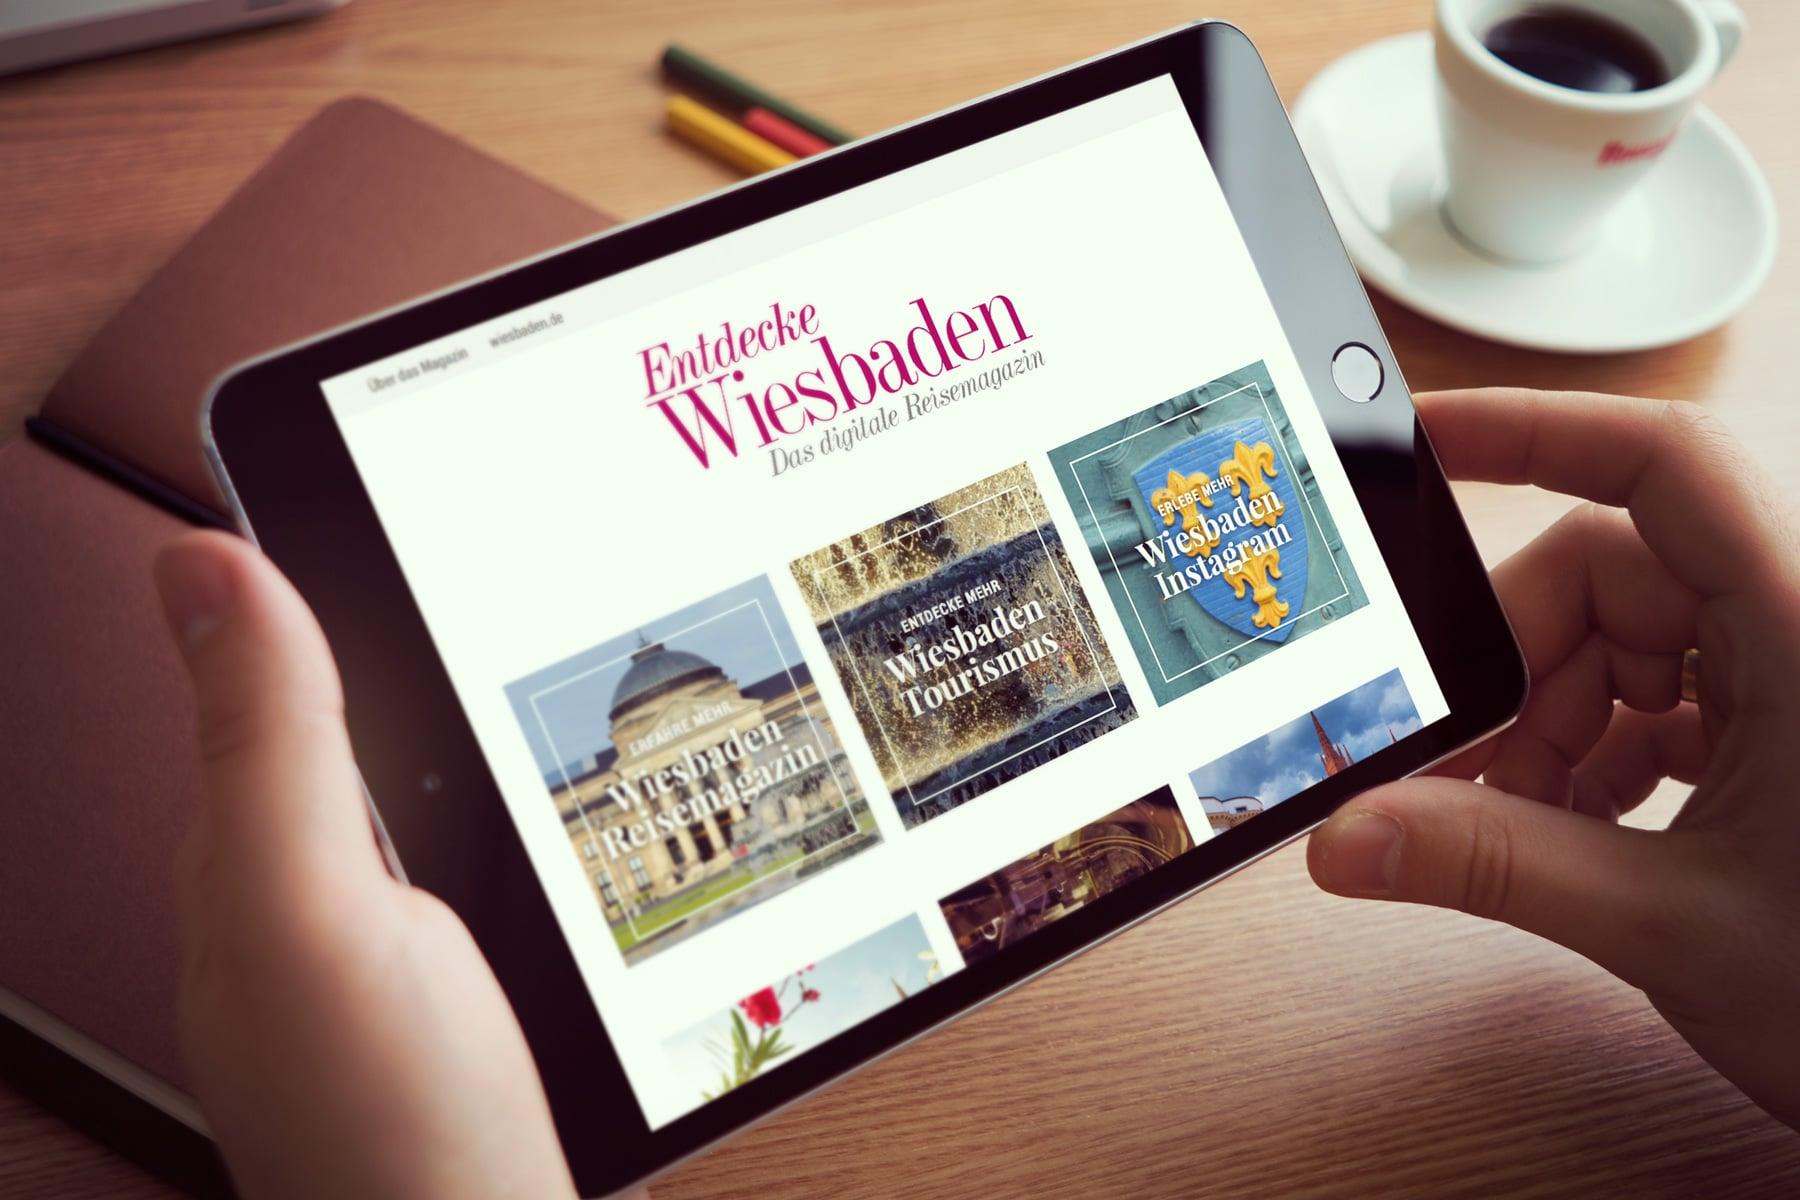 Entdecke Wiesbaden - Das digitale Reisemagazin